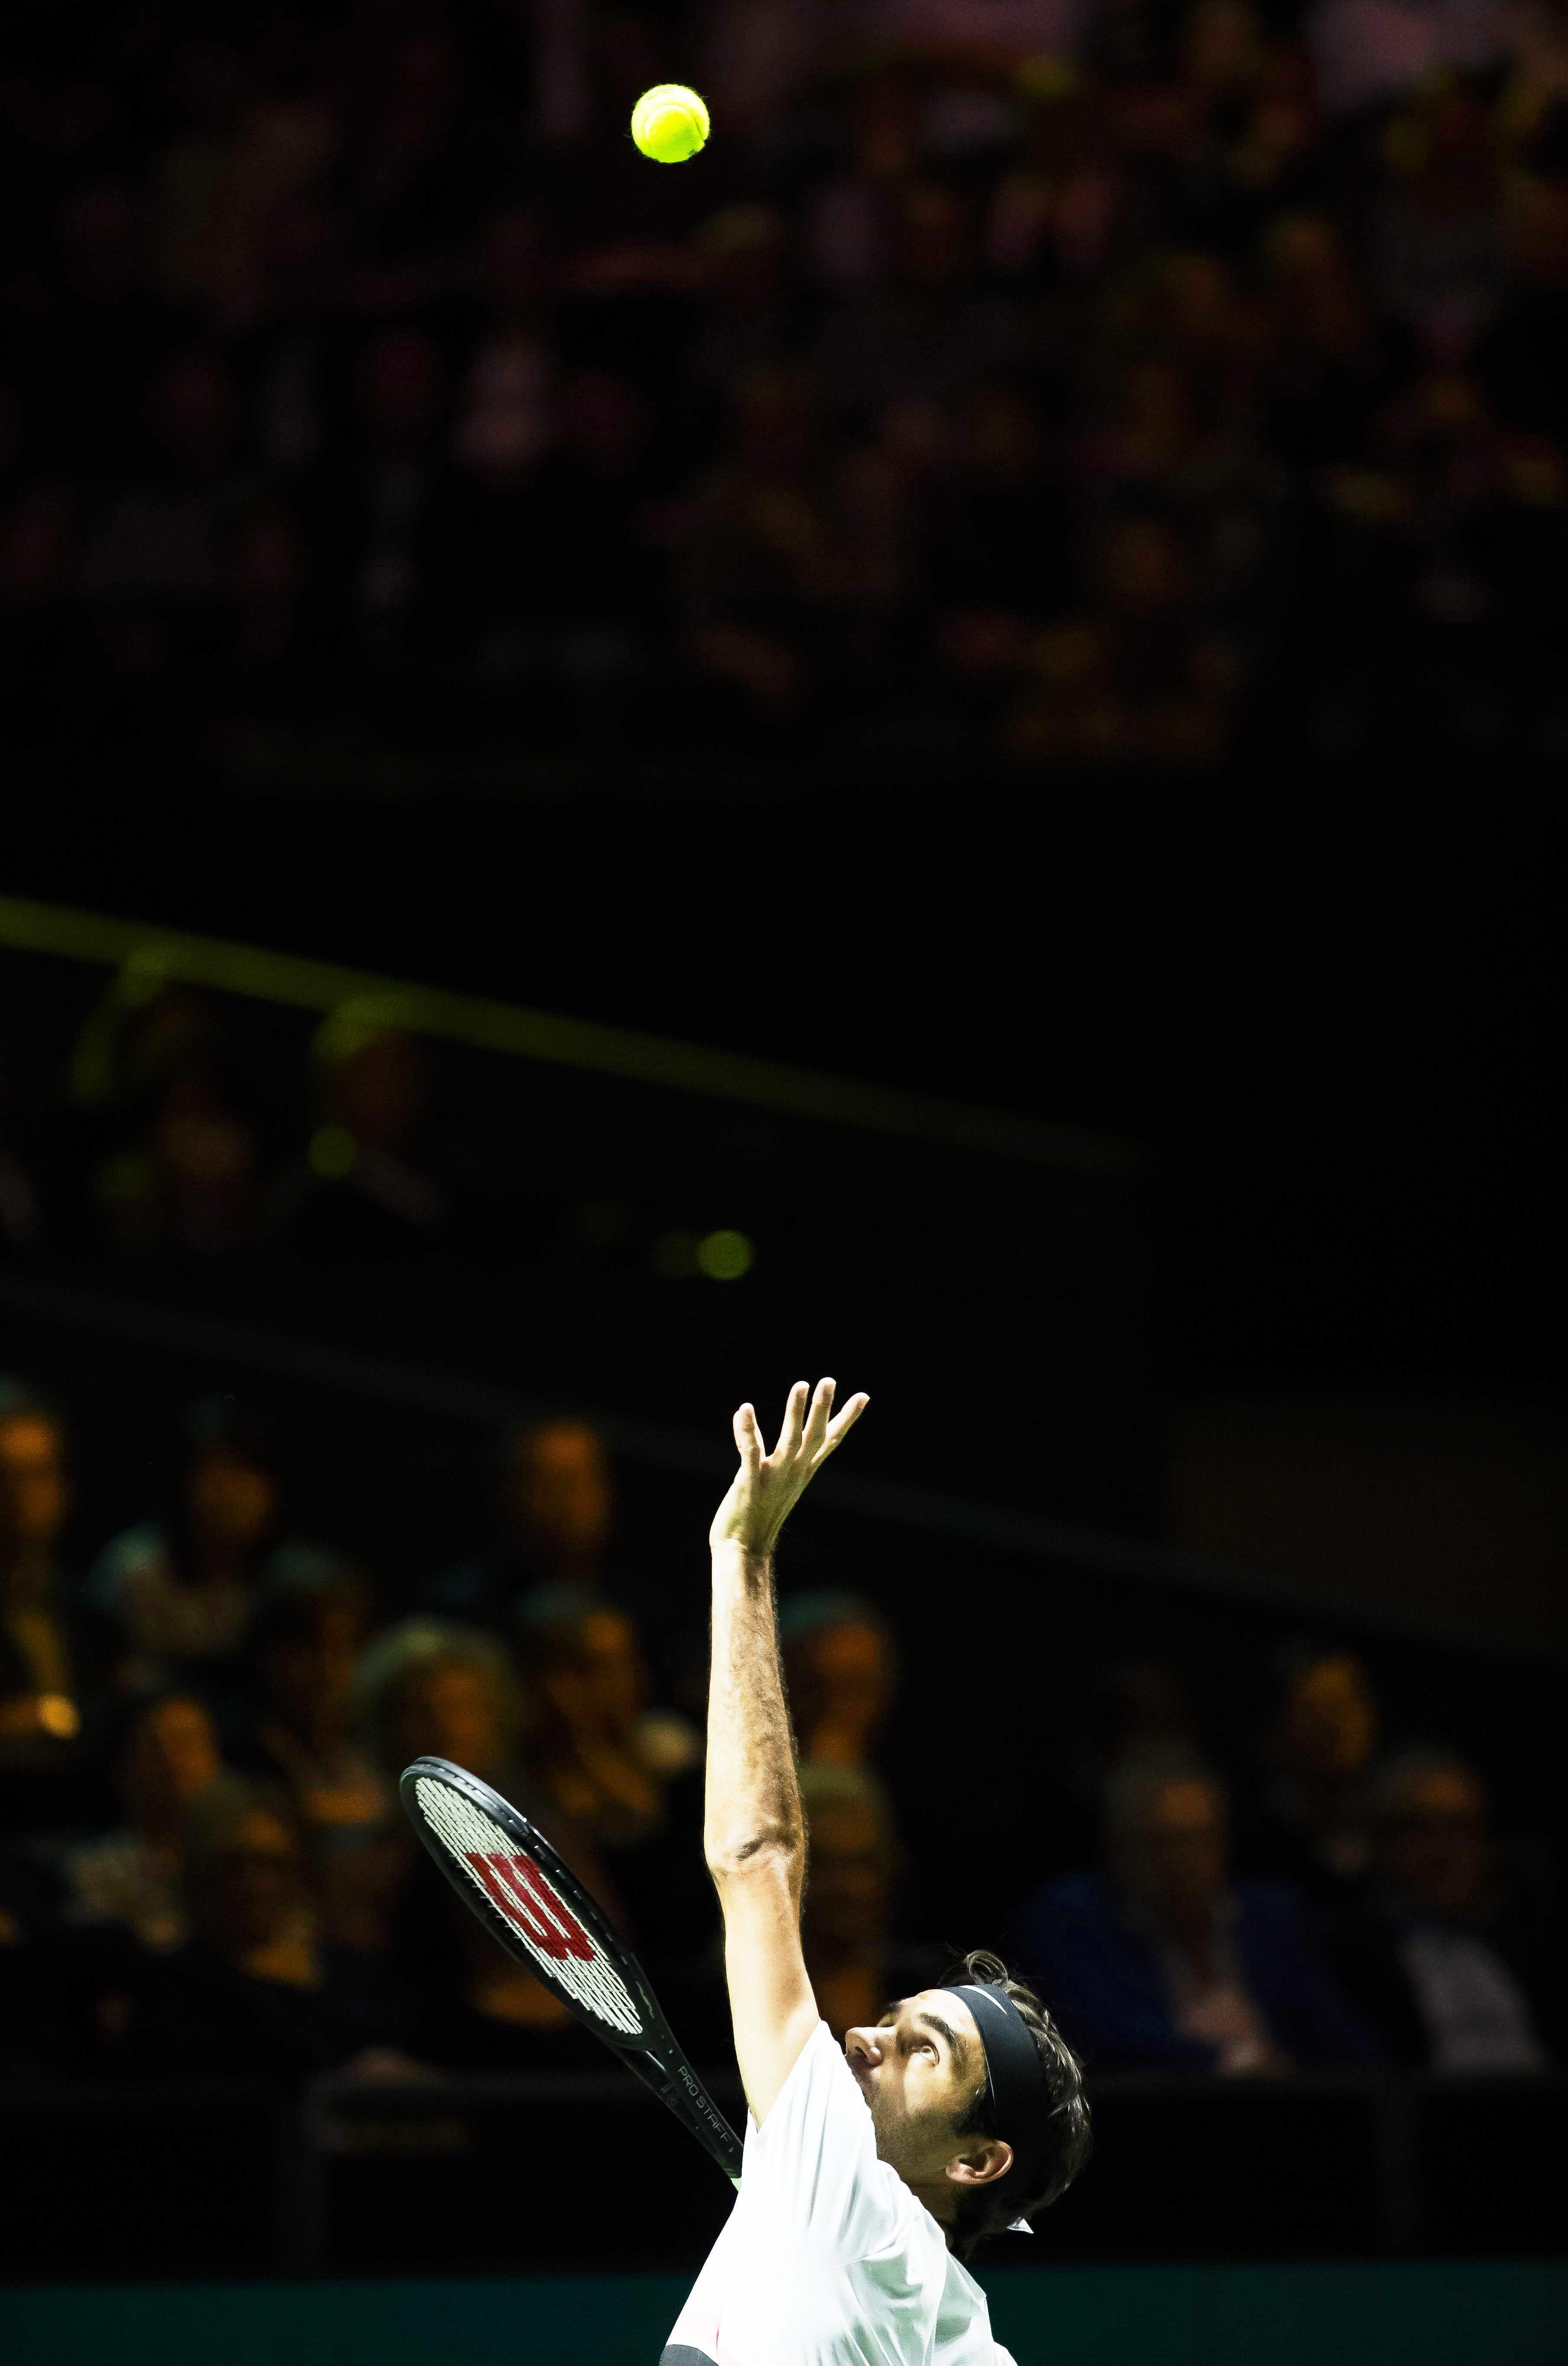 Roger Federer volverá a ser número 1 si llega a semifinales en Rotterdam. Foto: EFE